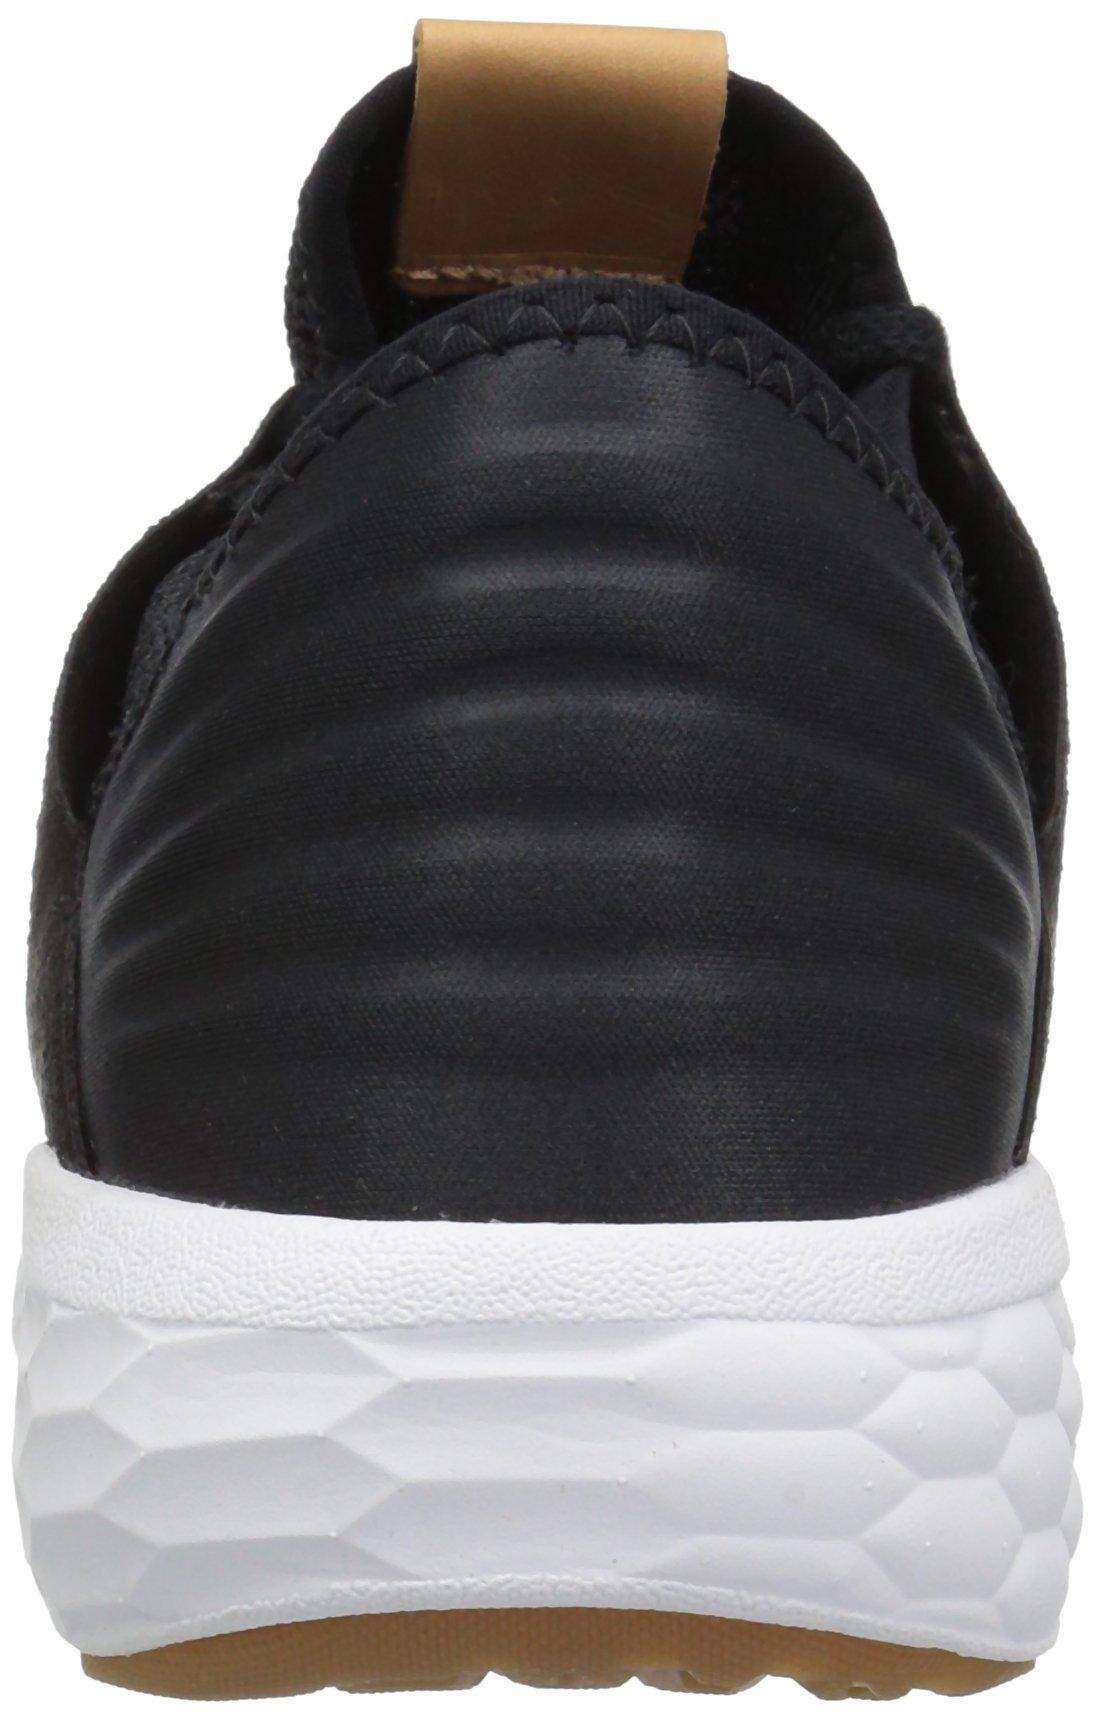 New Balance Women's Fresh Foam Cruz V2 Sneaker, Black/White, 12 D US